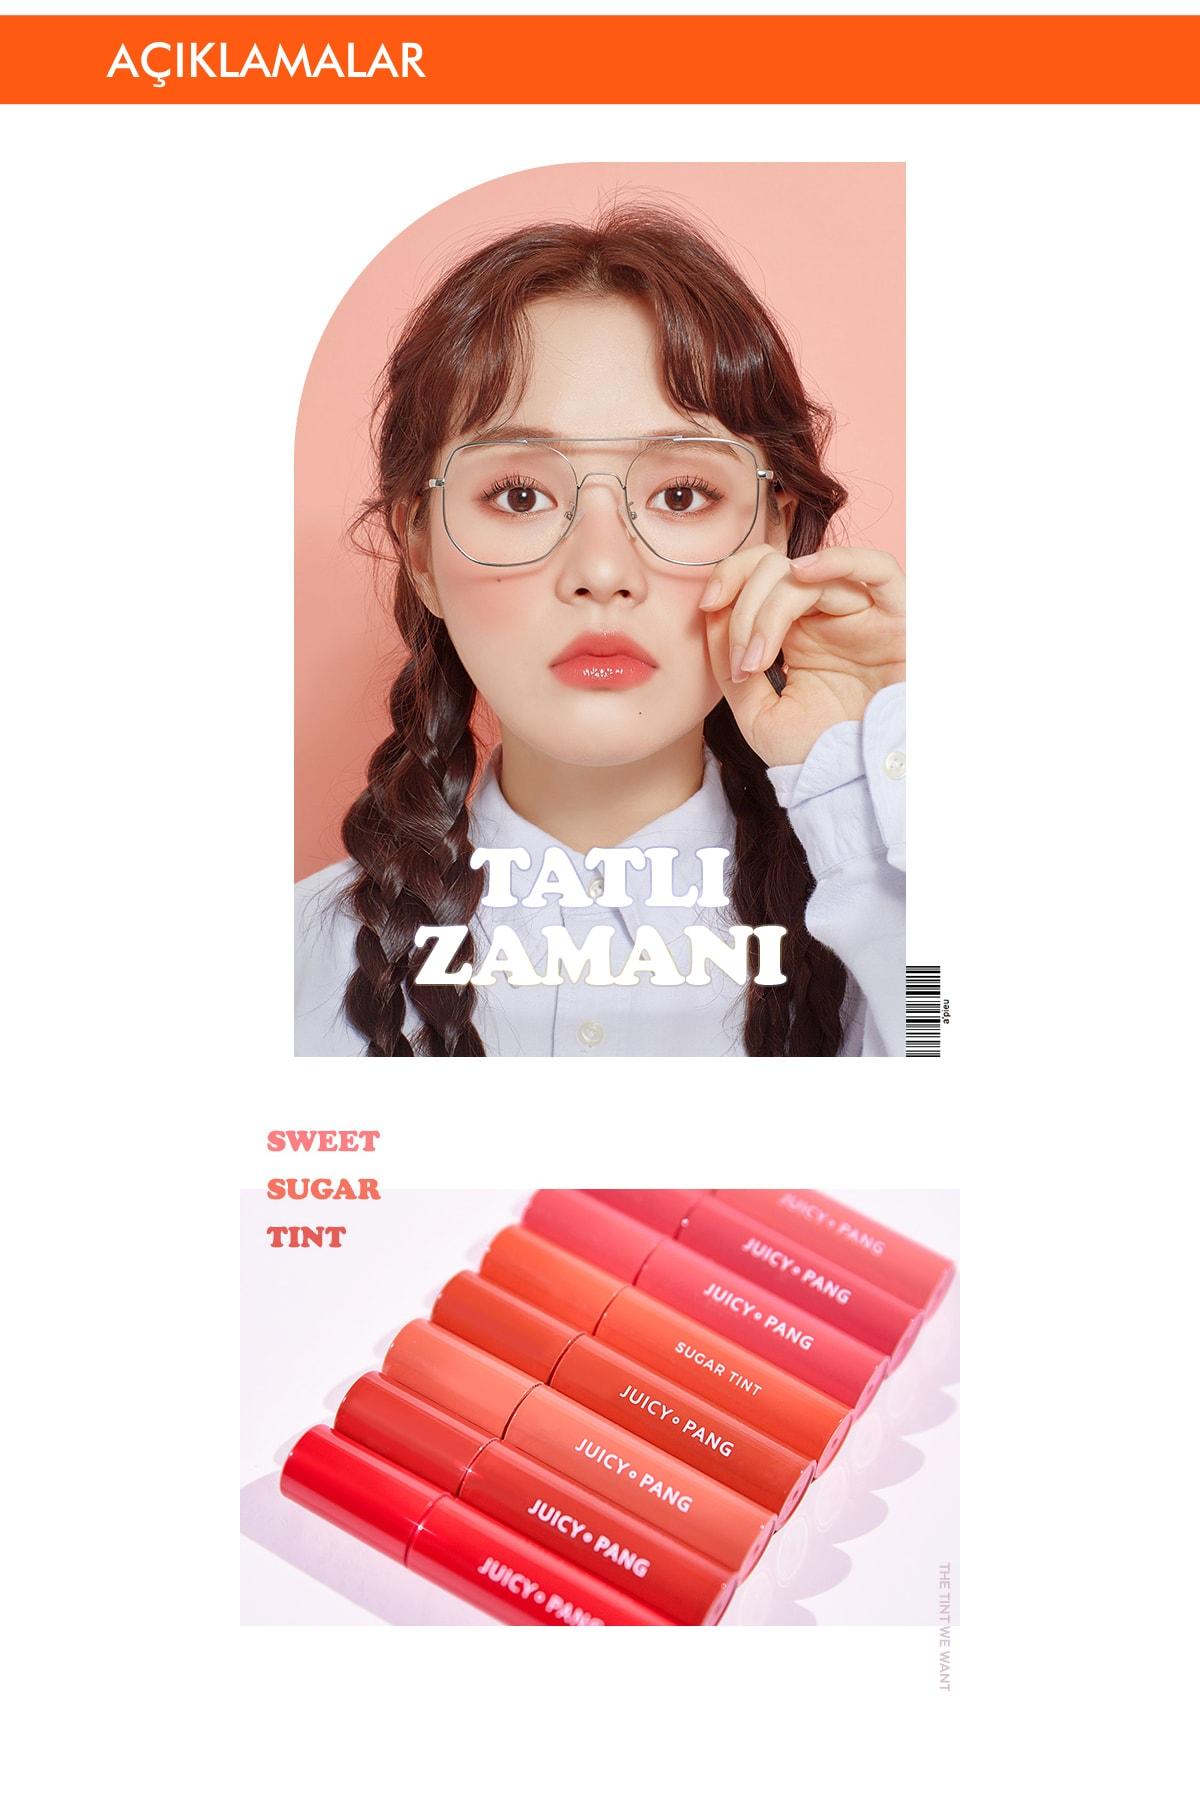 Missha Uzun Süre Kalıcı Parlak Su Bazlı Jel Tint APIEU Juicy-Pang Sugar Tint (CR02) 1